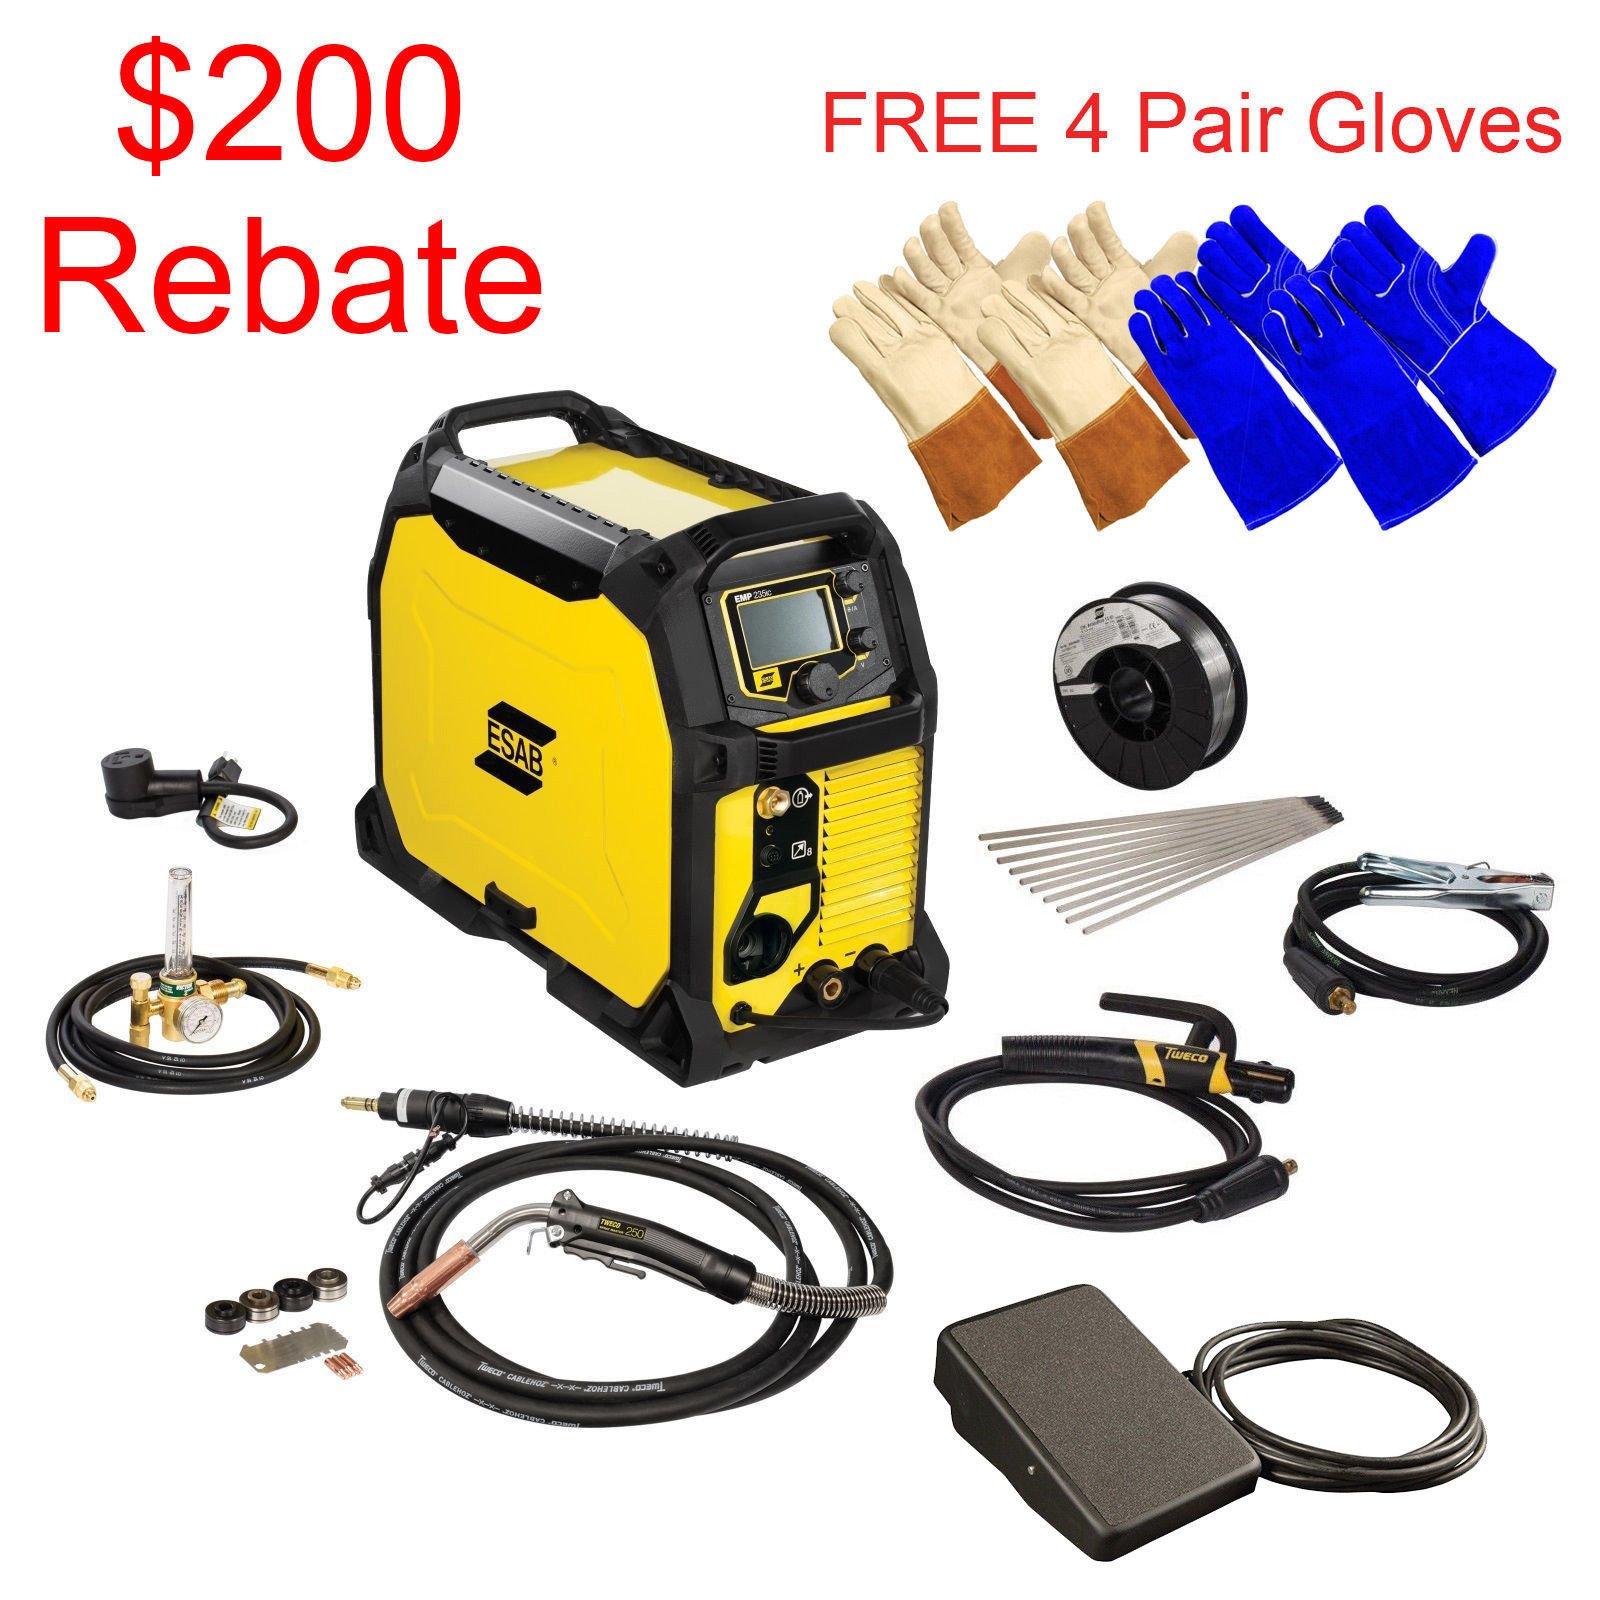 Buy ESAB Rebel EMP 215ic MIG/Stick/Tig Welding Machine